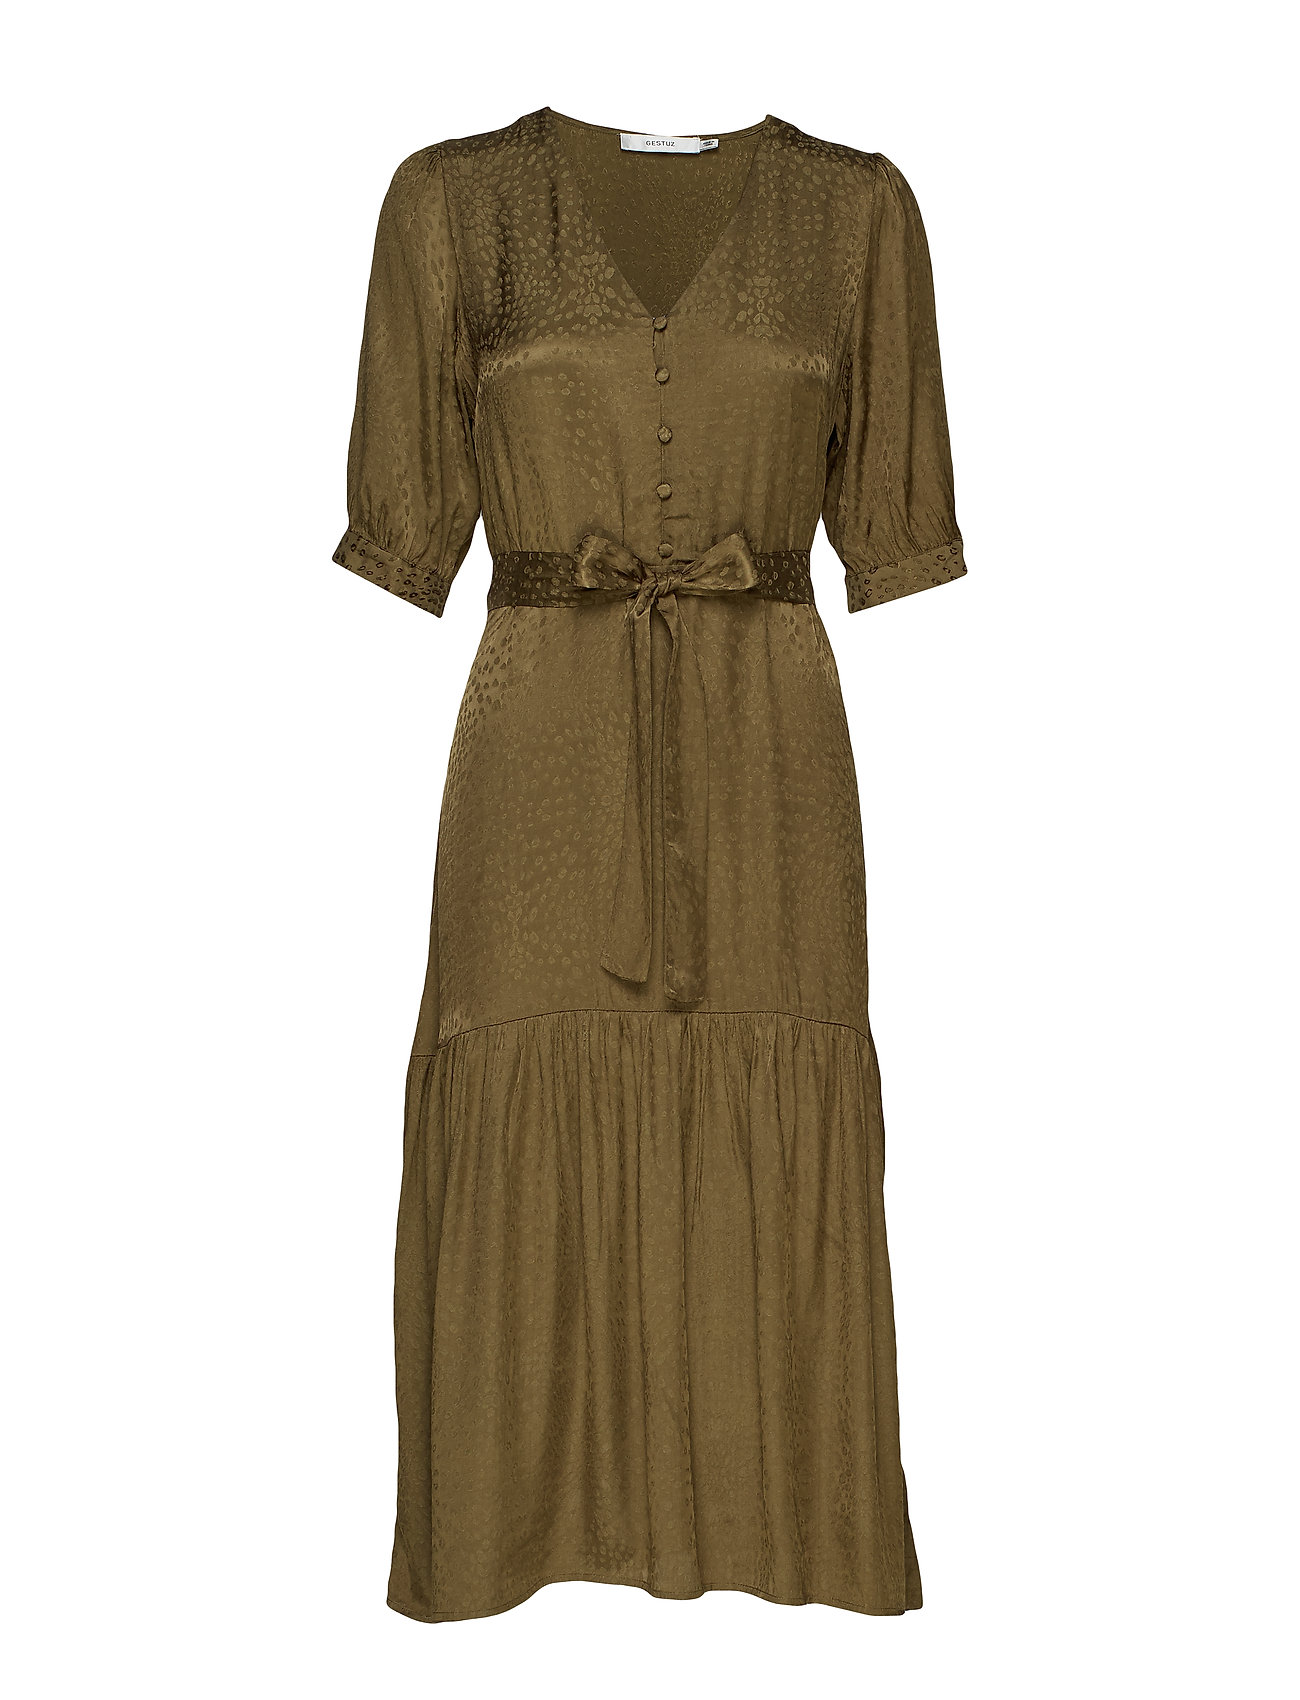 Long Long Dress Dress OliveGestuz Irinagz Ao19dark Irinagz Long Irinagz OliveGestuz Ao19dark TJclF13K